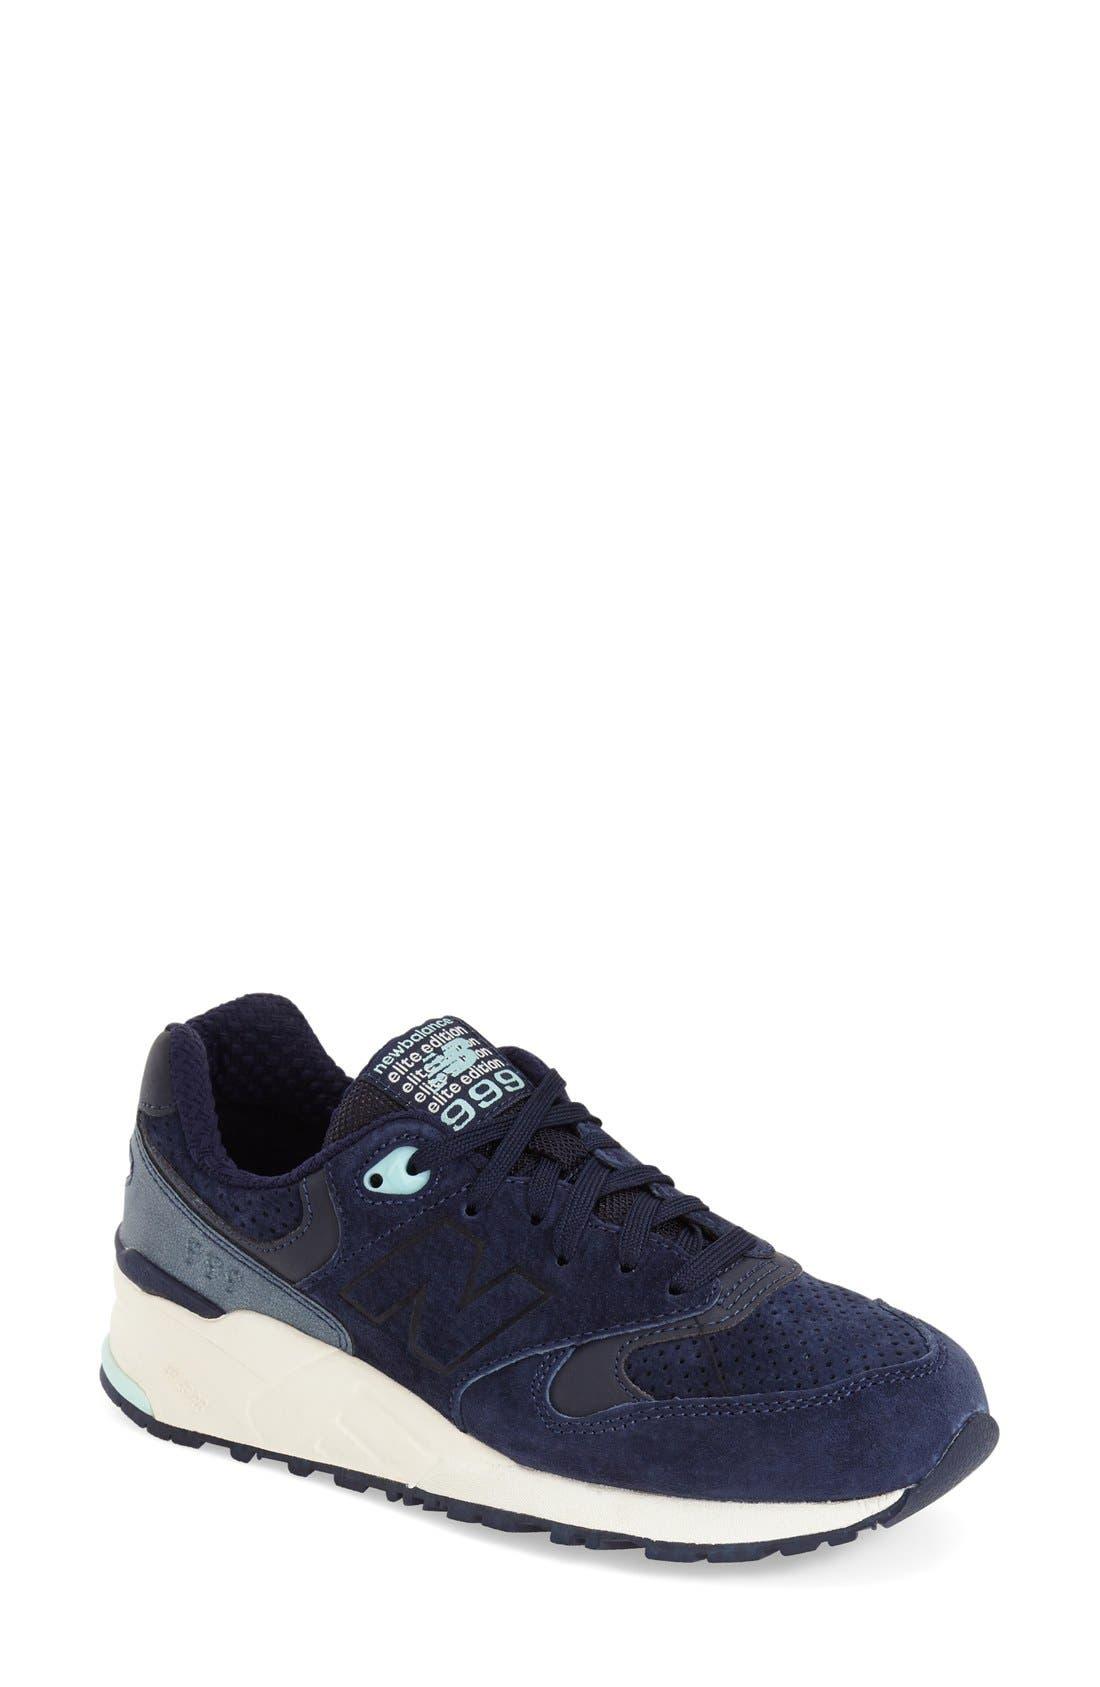 Main Image - New Balance '999' Sneaker (Women)